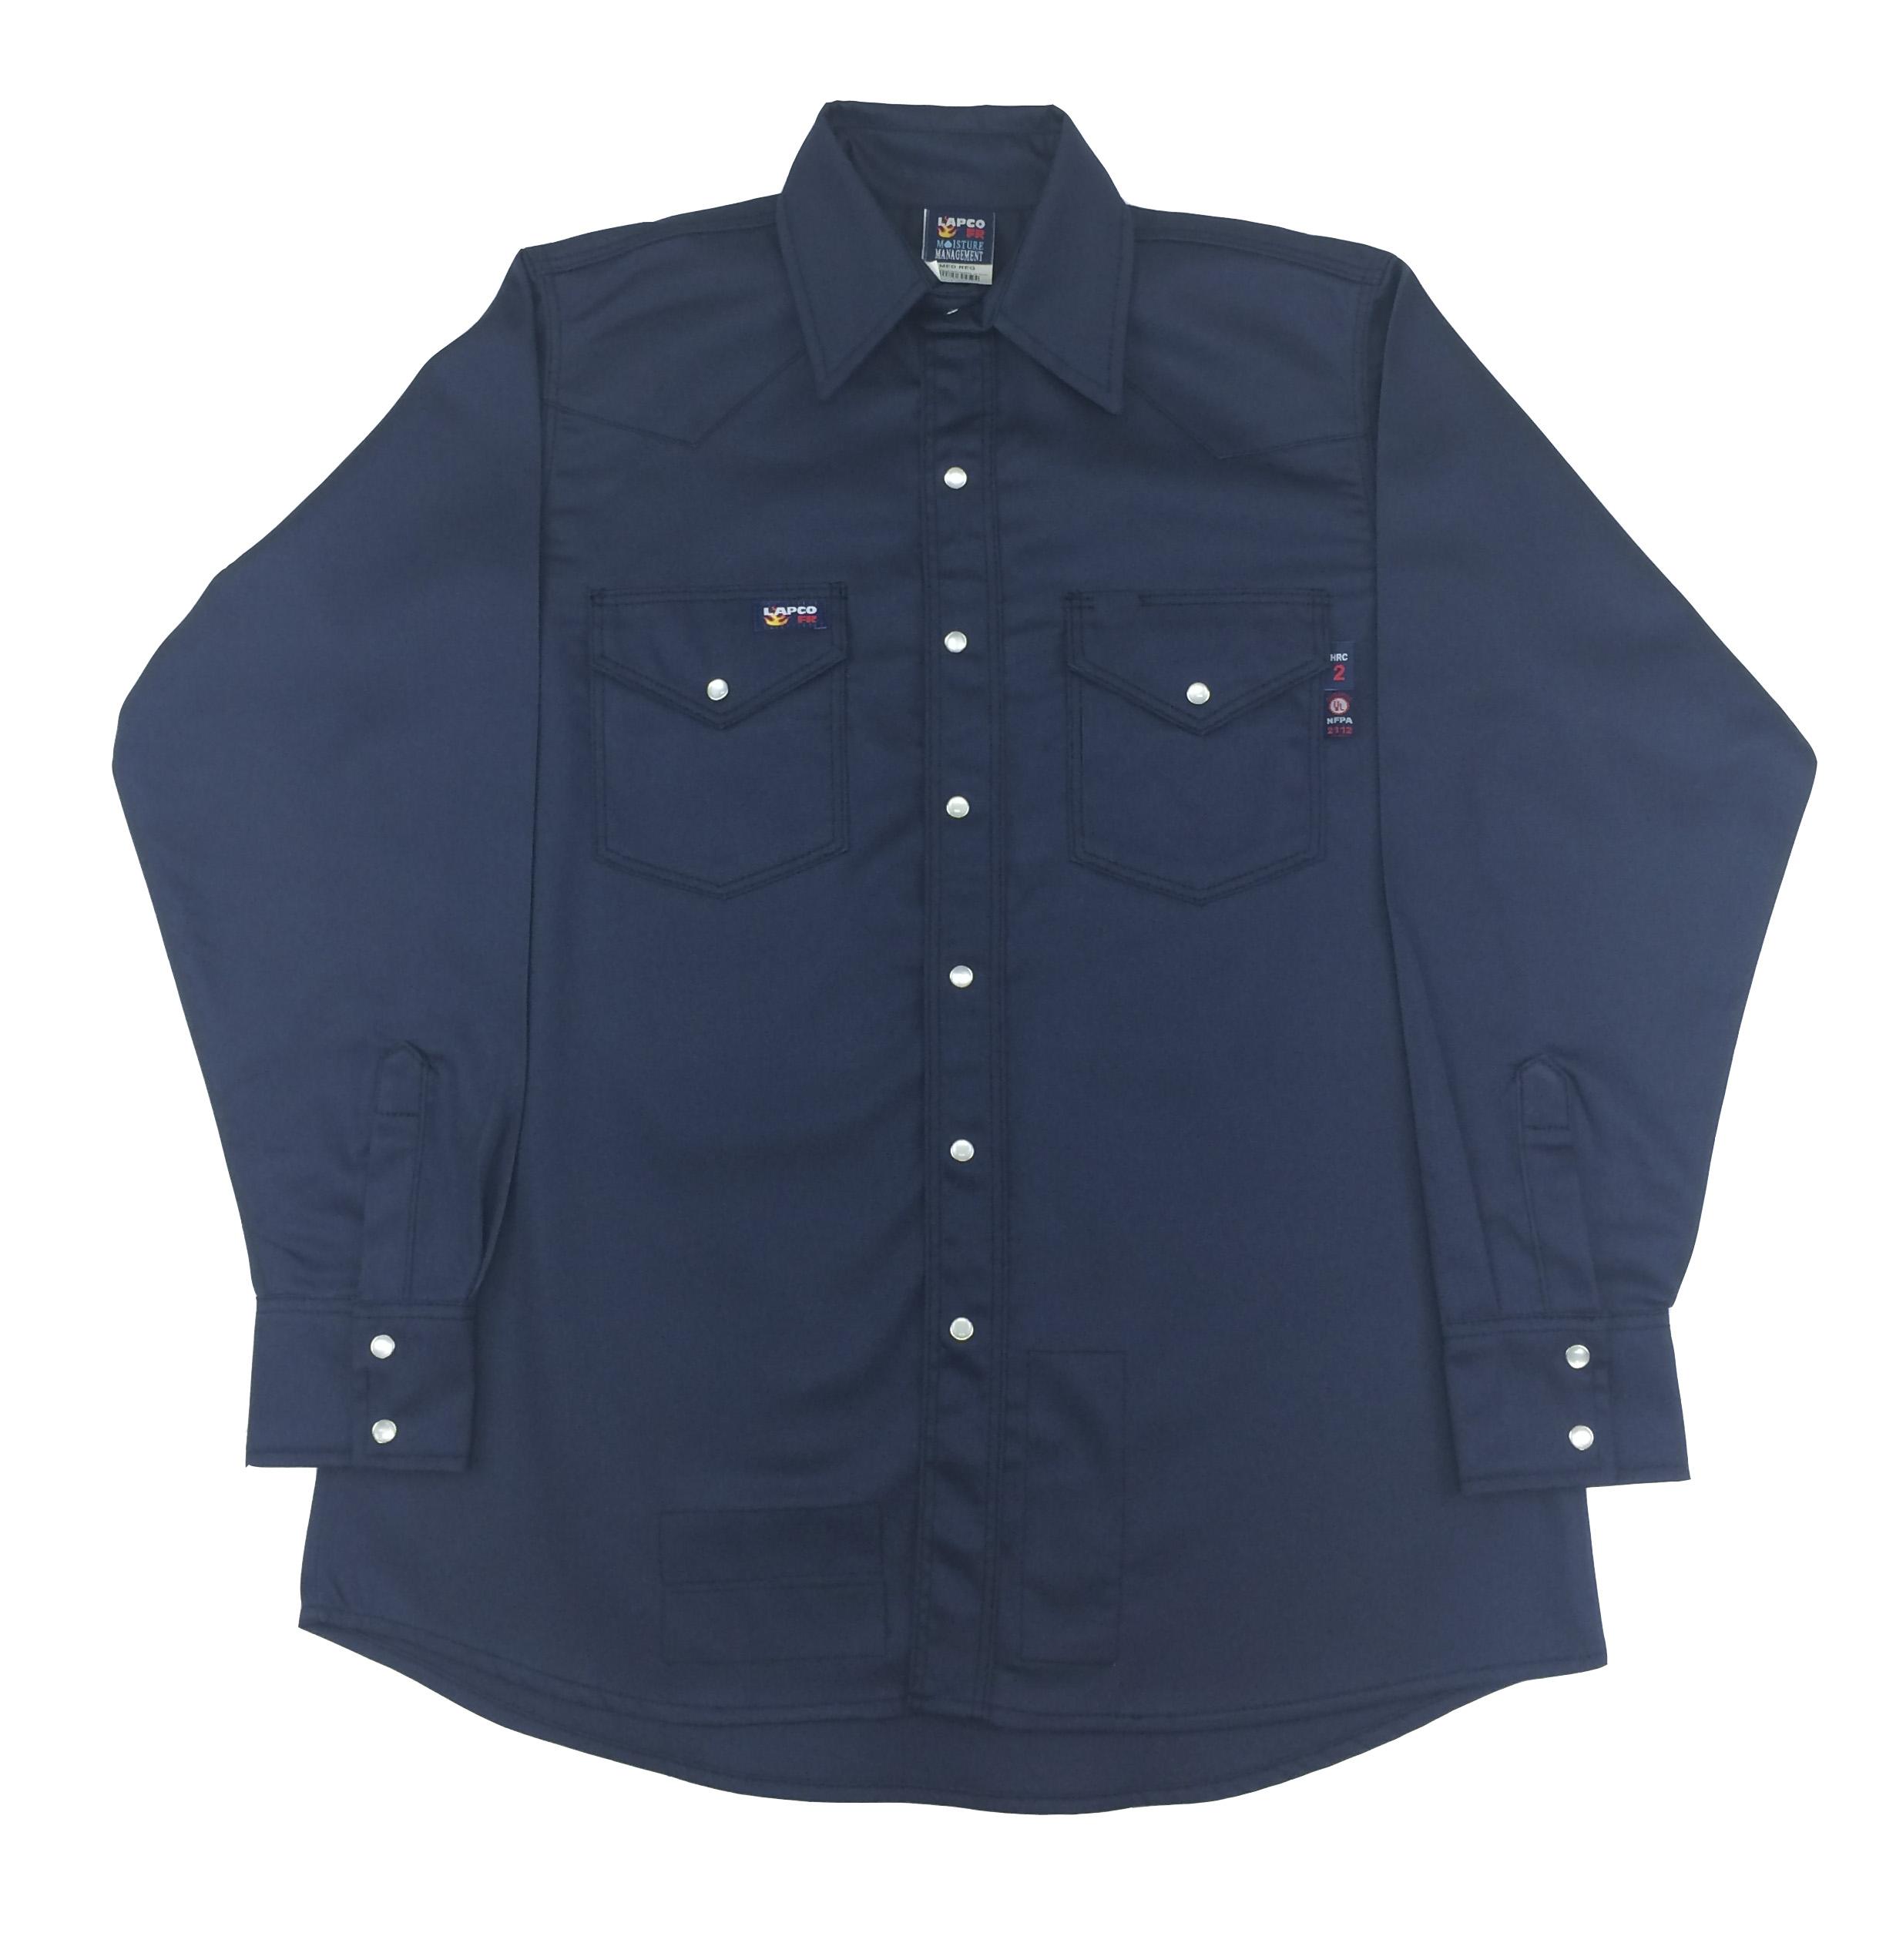 92dffc87abb2 Lapco FR Western Shirt w Snaps - Navy Lapco